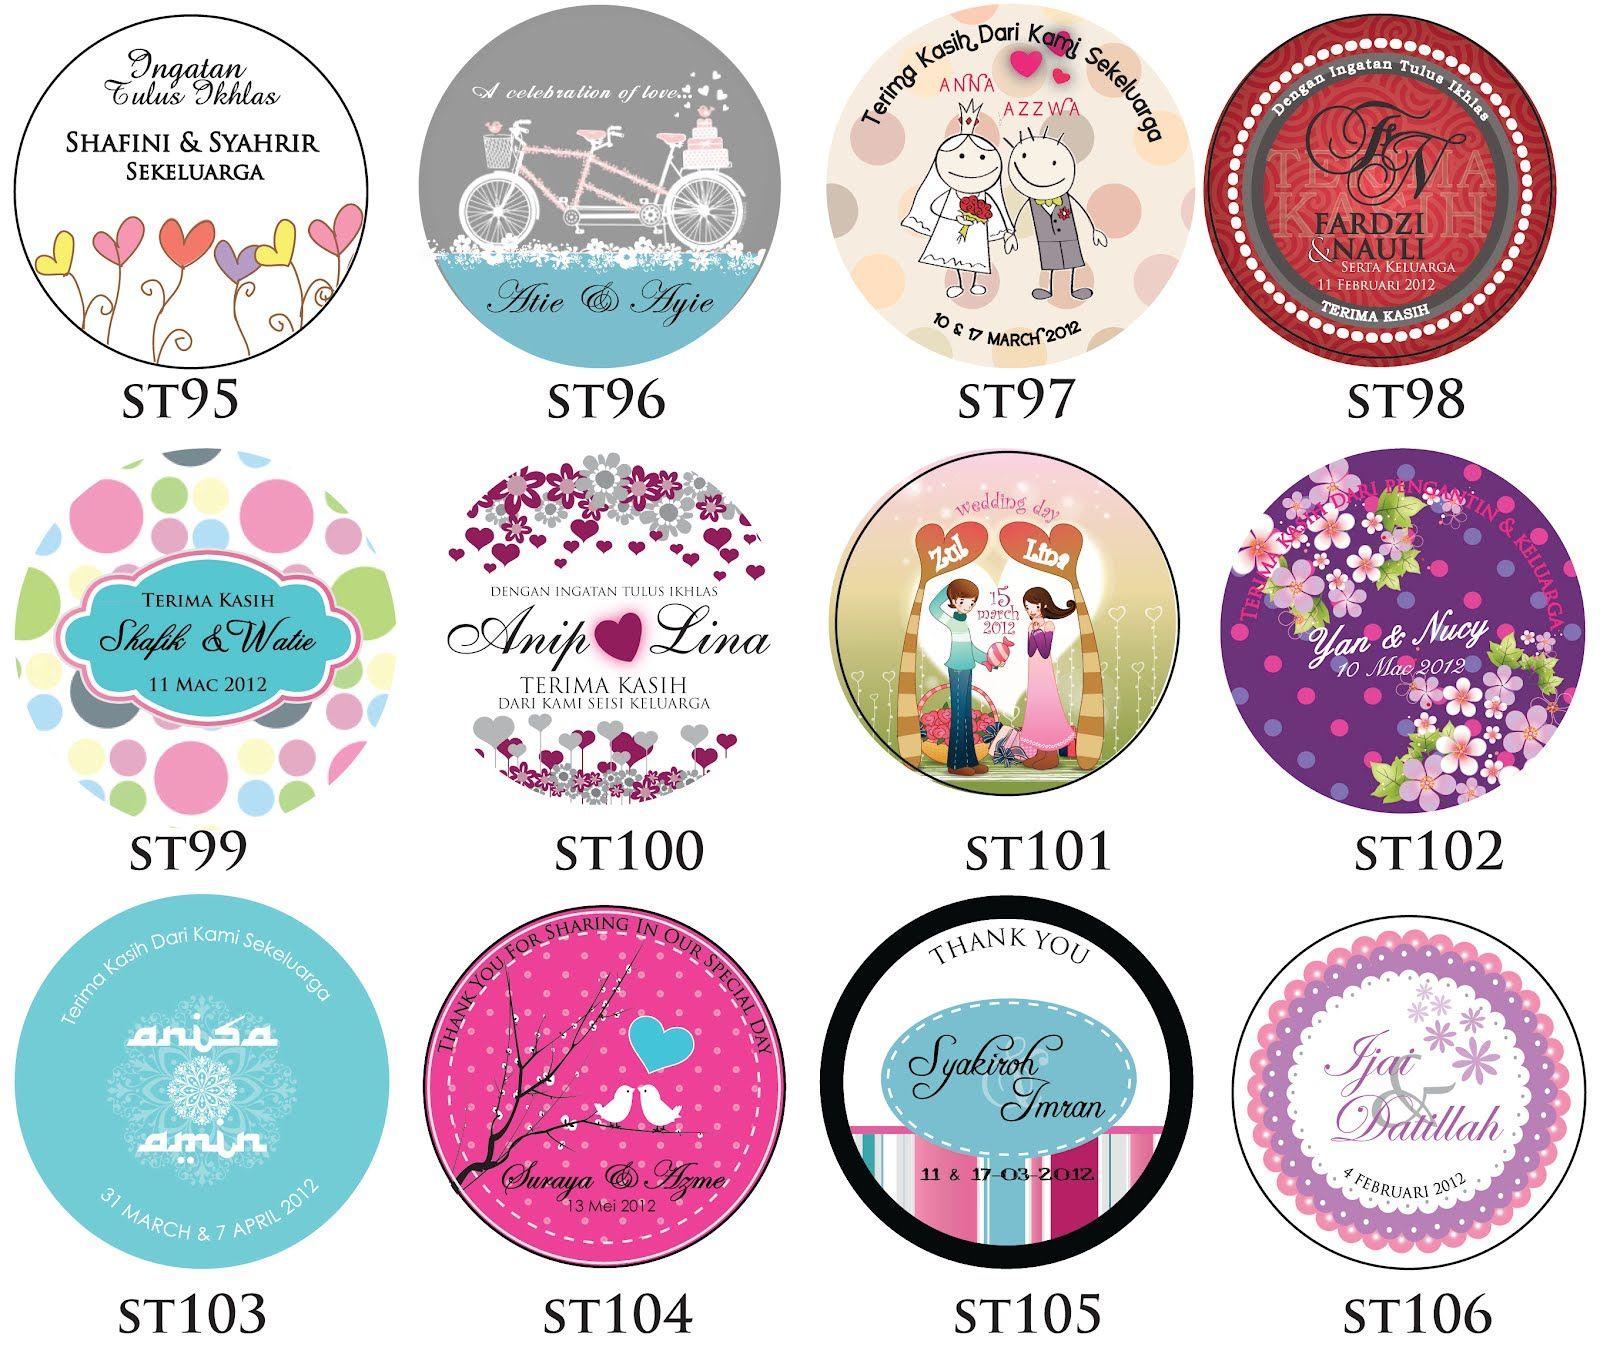 Ceria Kad Kahwin New Sticker 2012 Sticker Design Kad Kahwin Design New Sticker